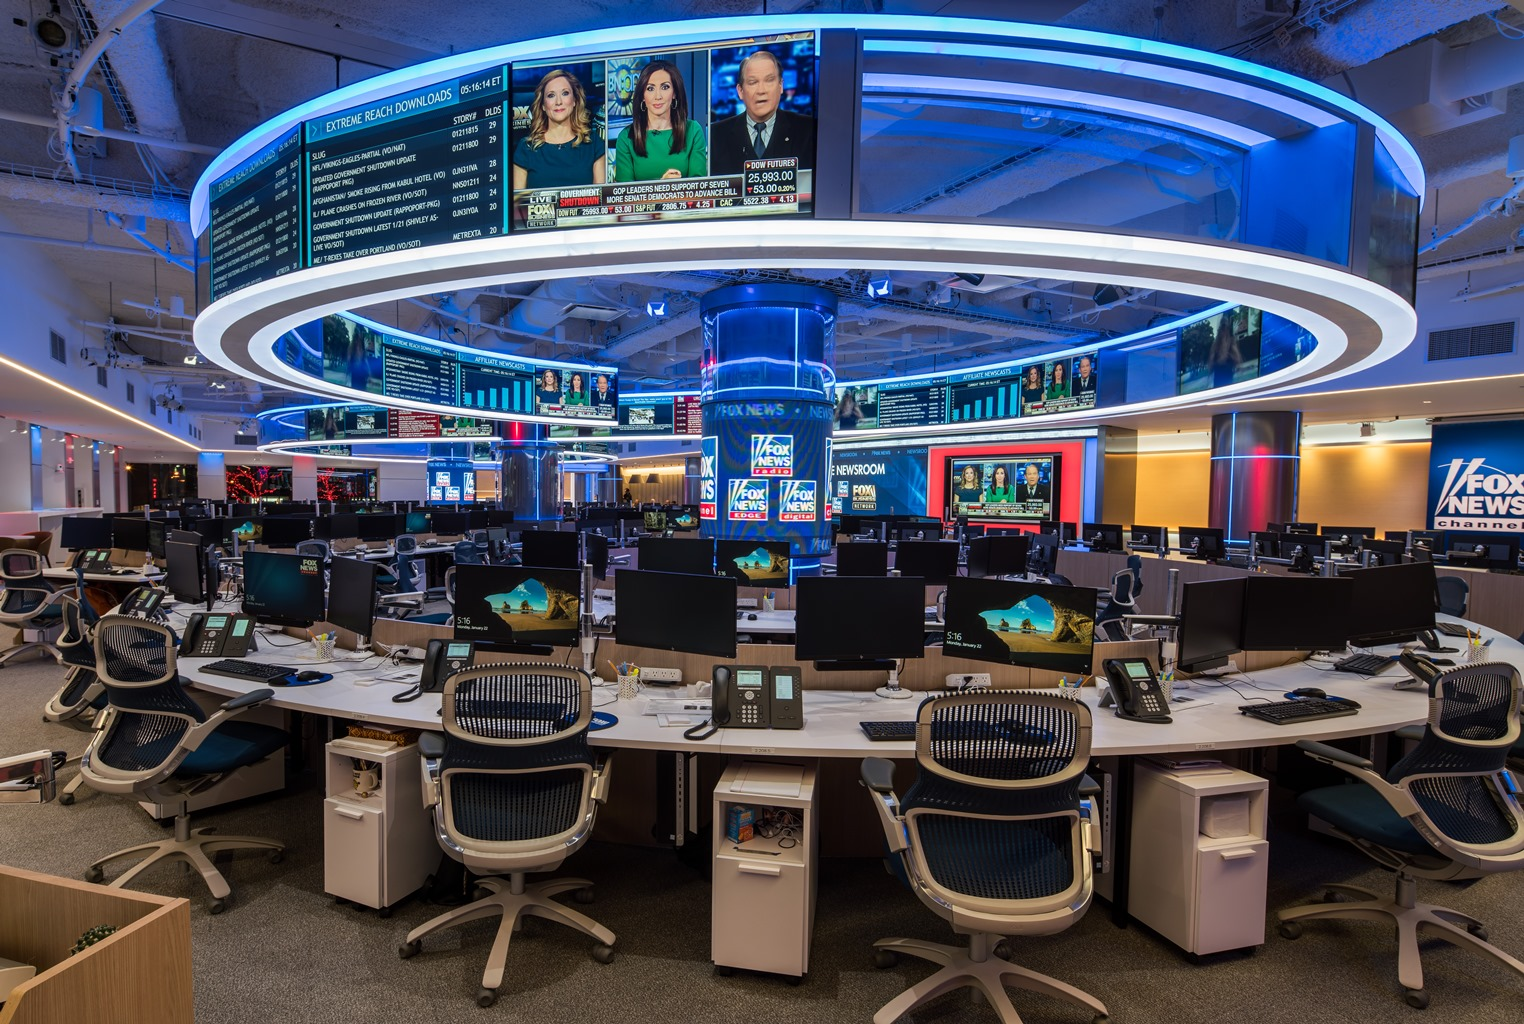 Harman Kardon Car Audio: TV With Thinus: Fox News Channel Unveils Its Brand-new